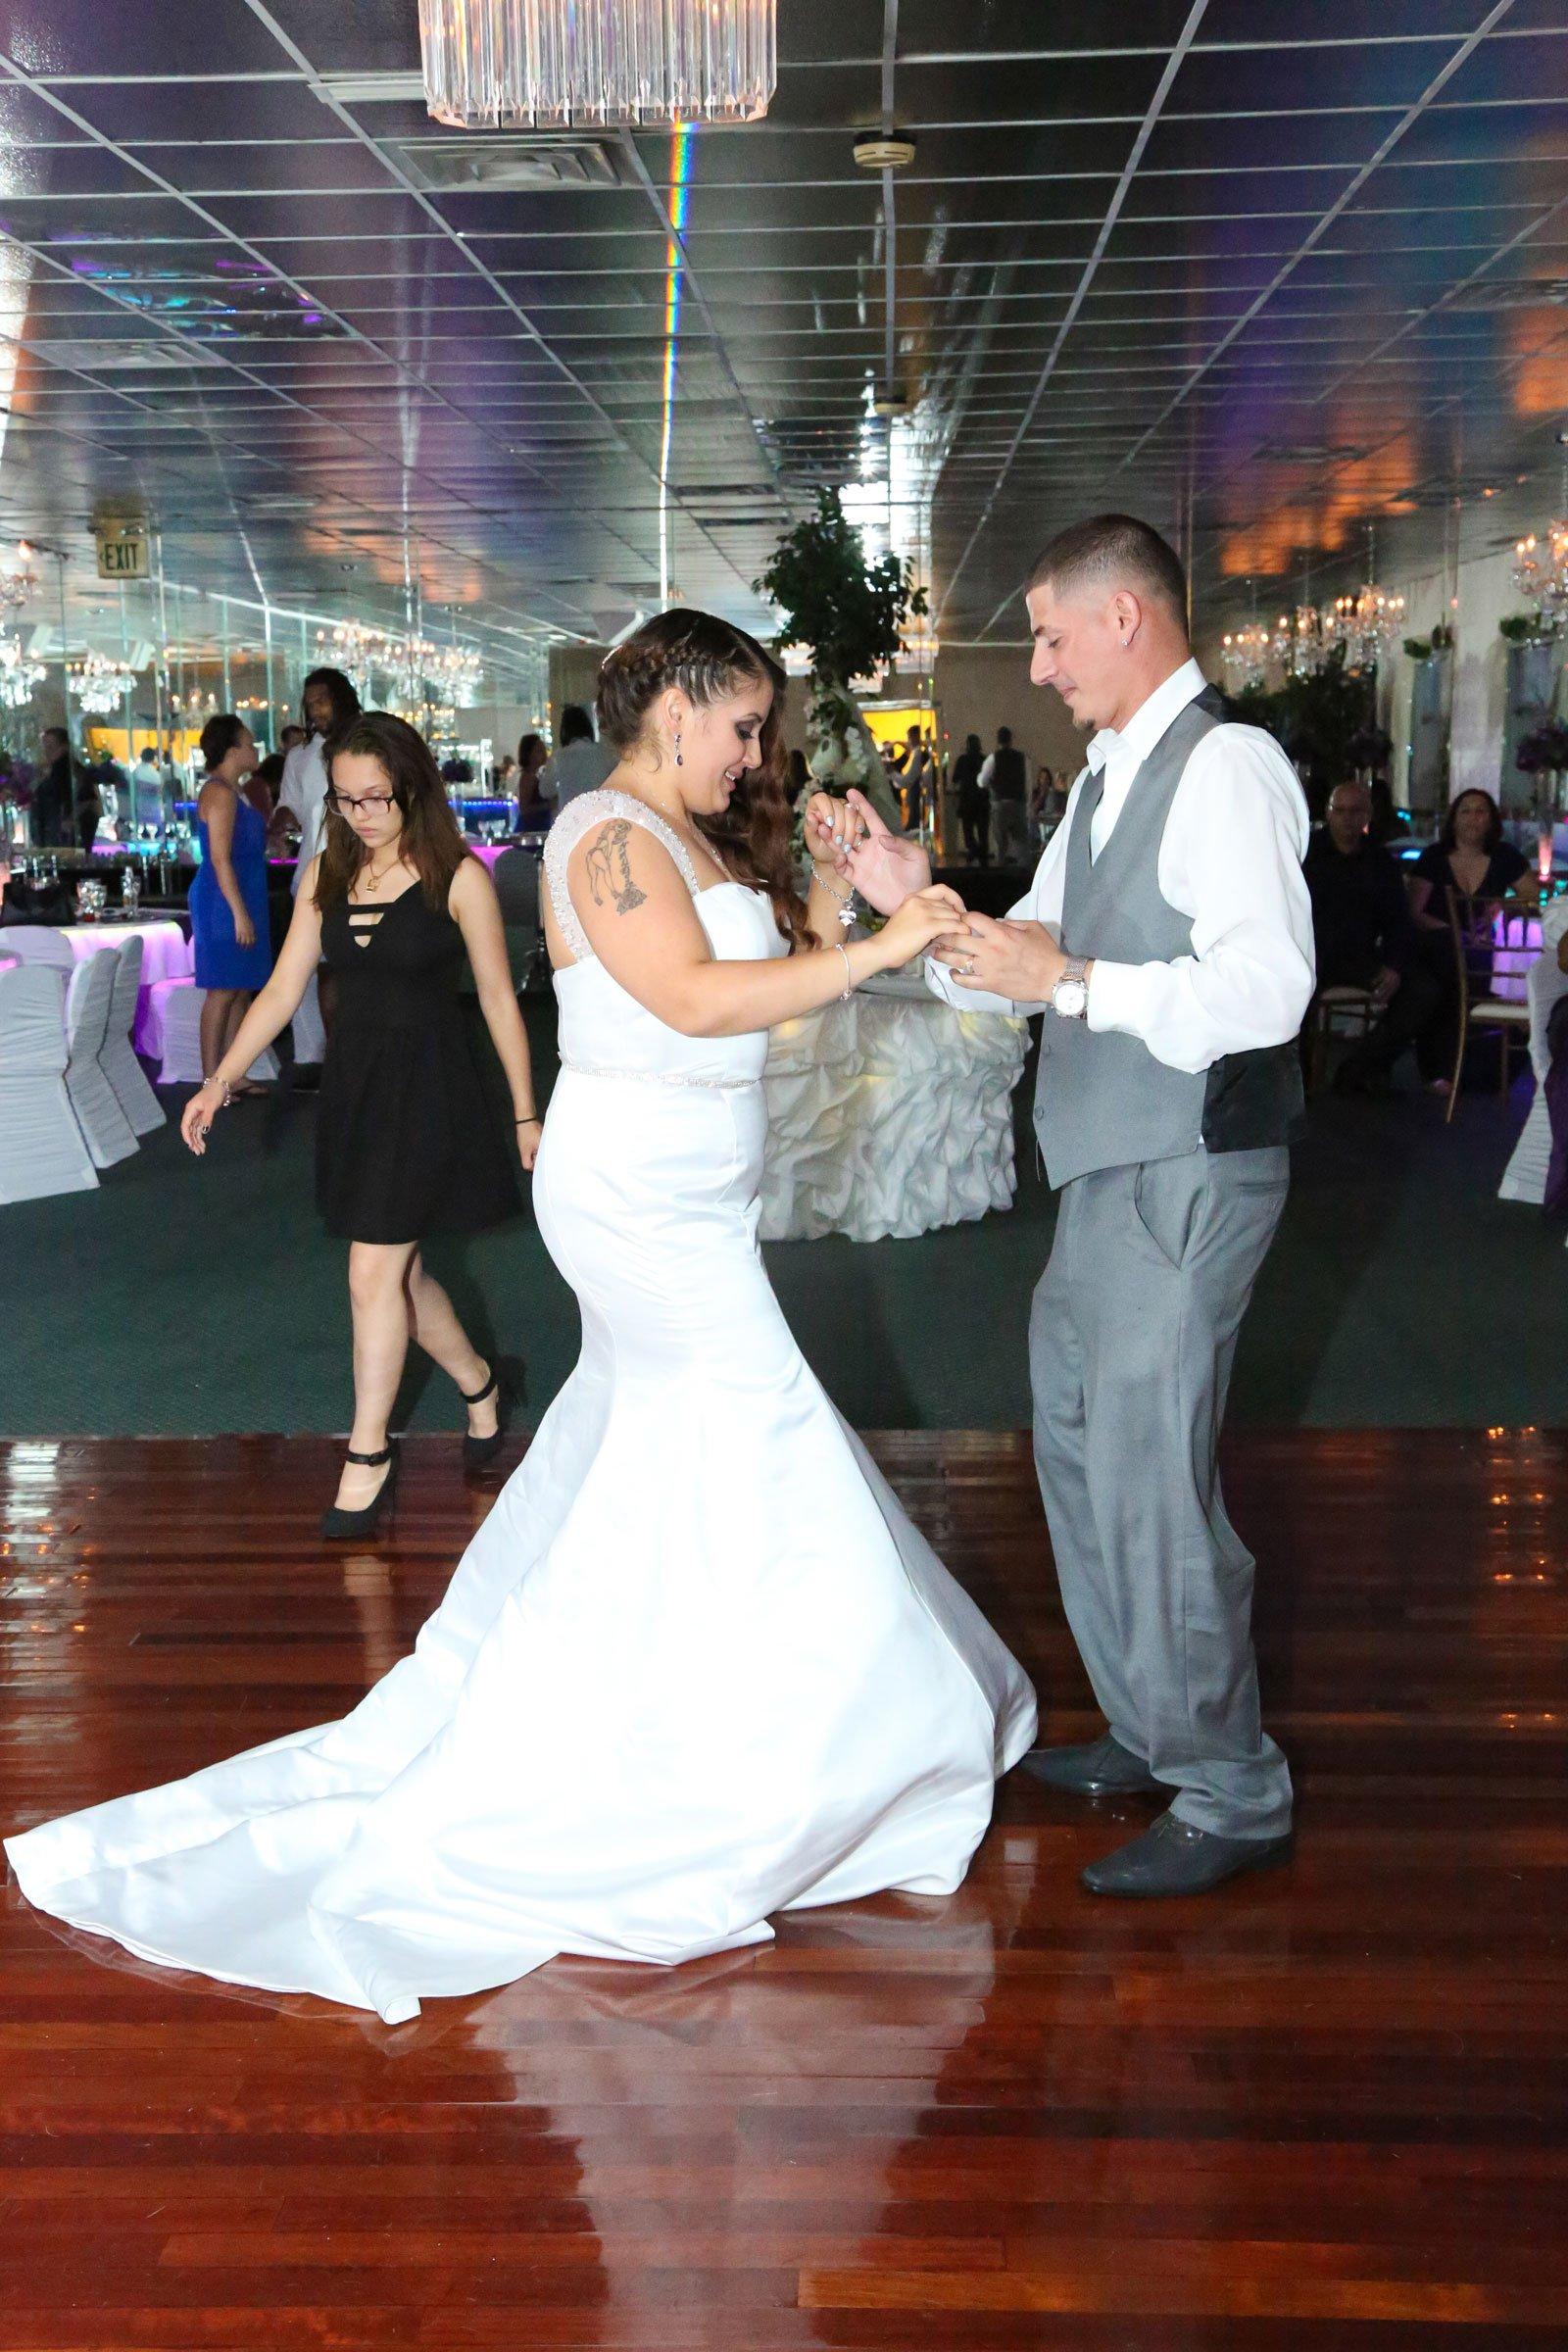 Buffalo, NY Wedding Reception bride and groom dance